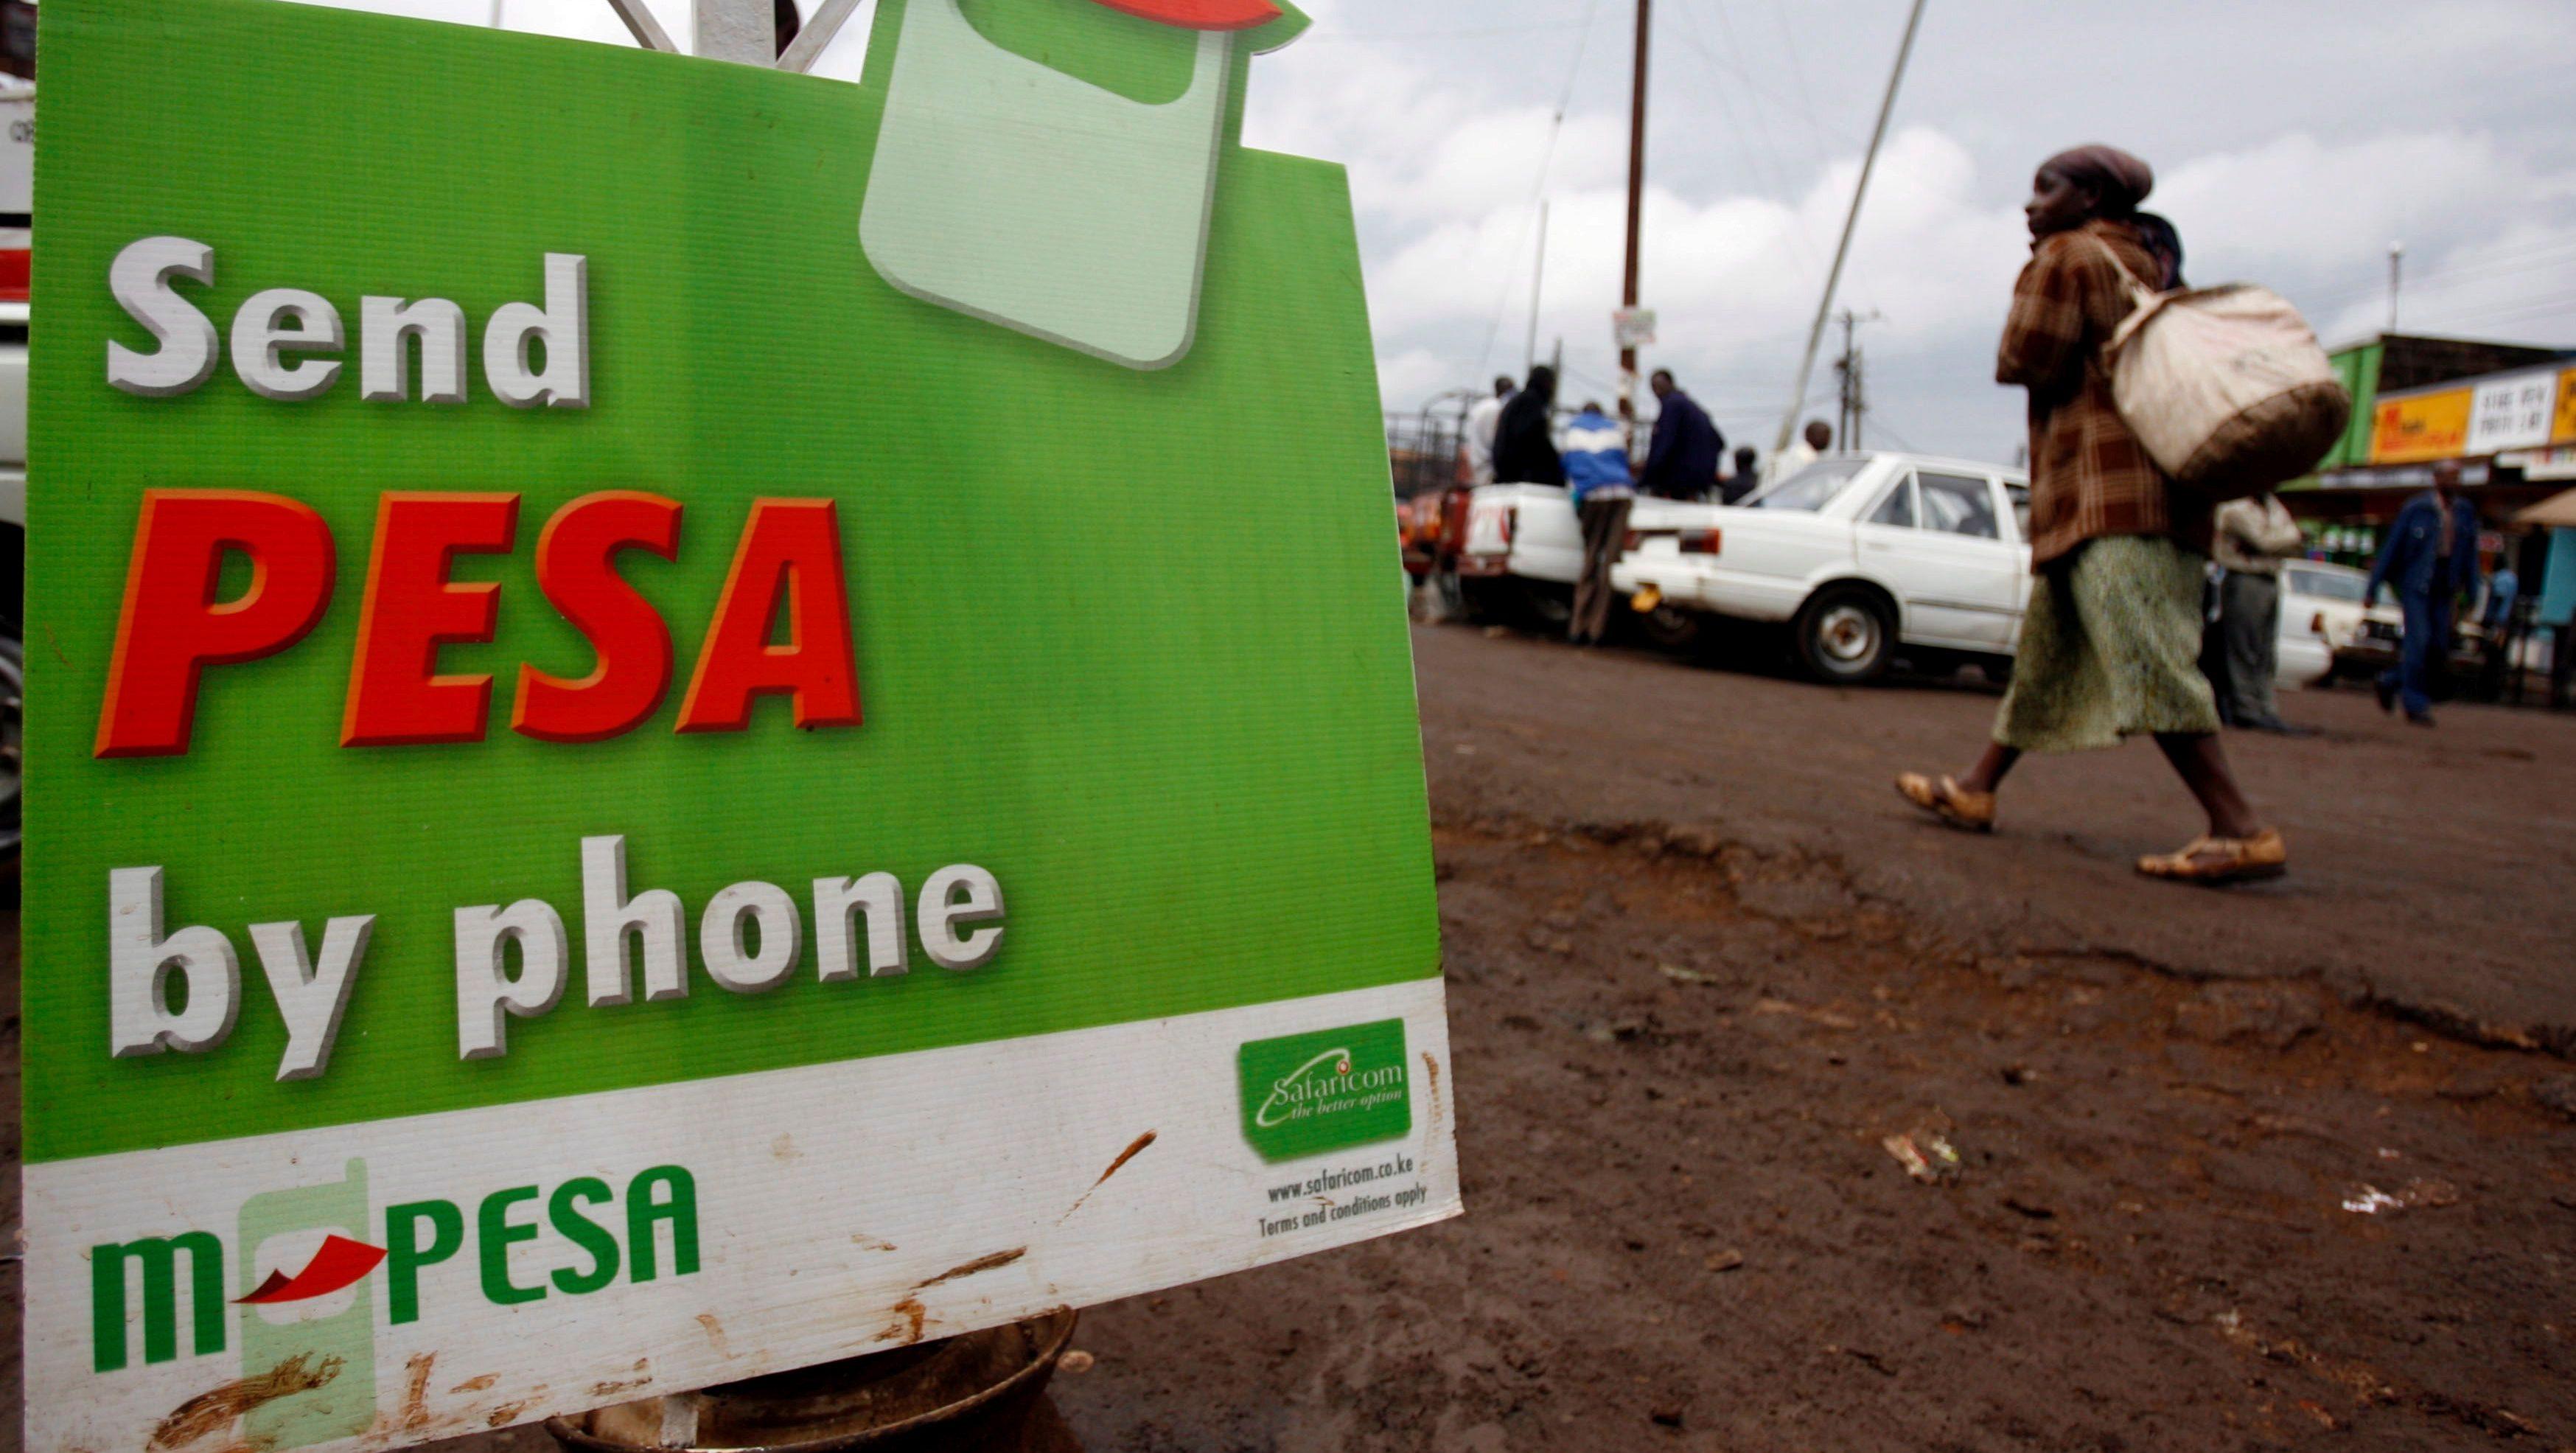 Ethiopia To Get M Pesa Mobile Money From Safaricom Kenya Quartz Africa Wiring